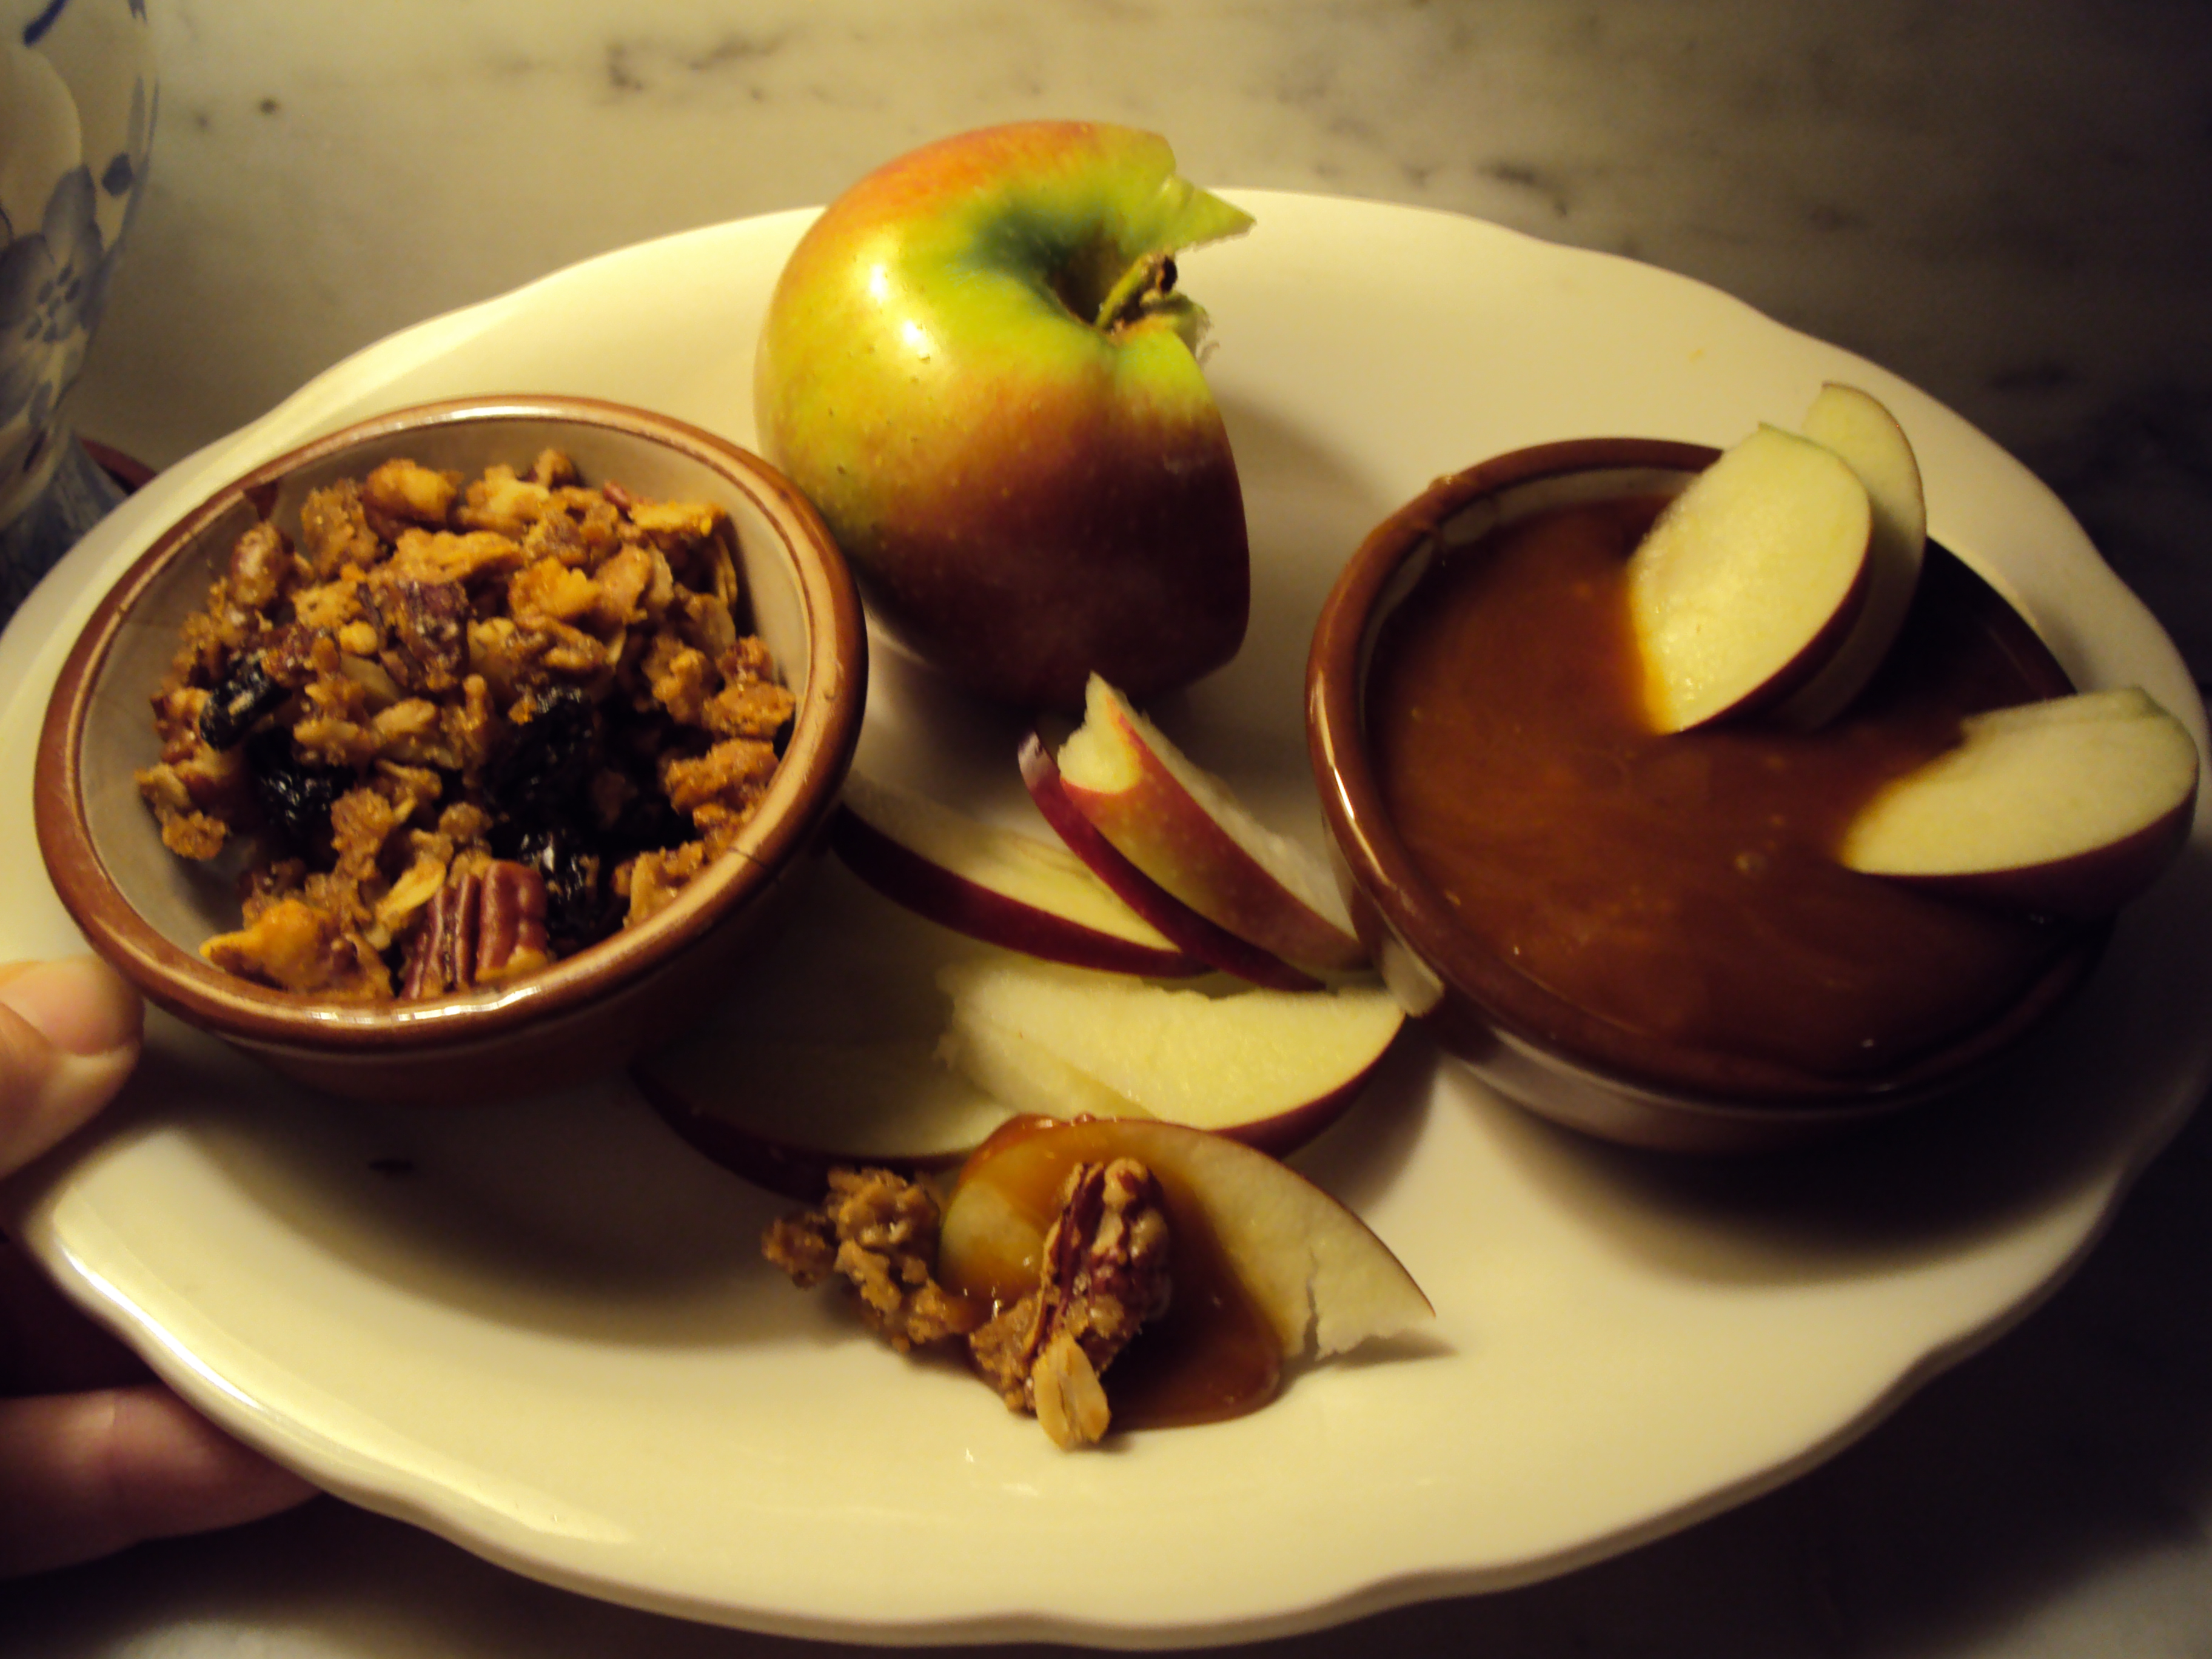 apples, caramel, granola